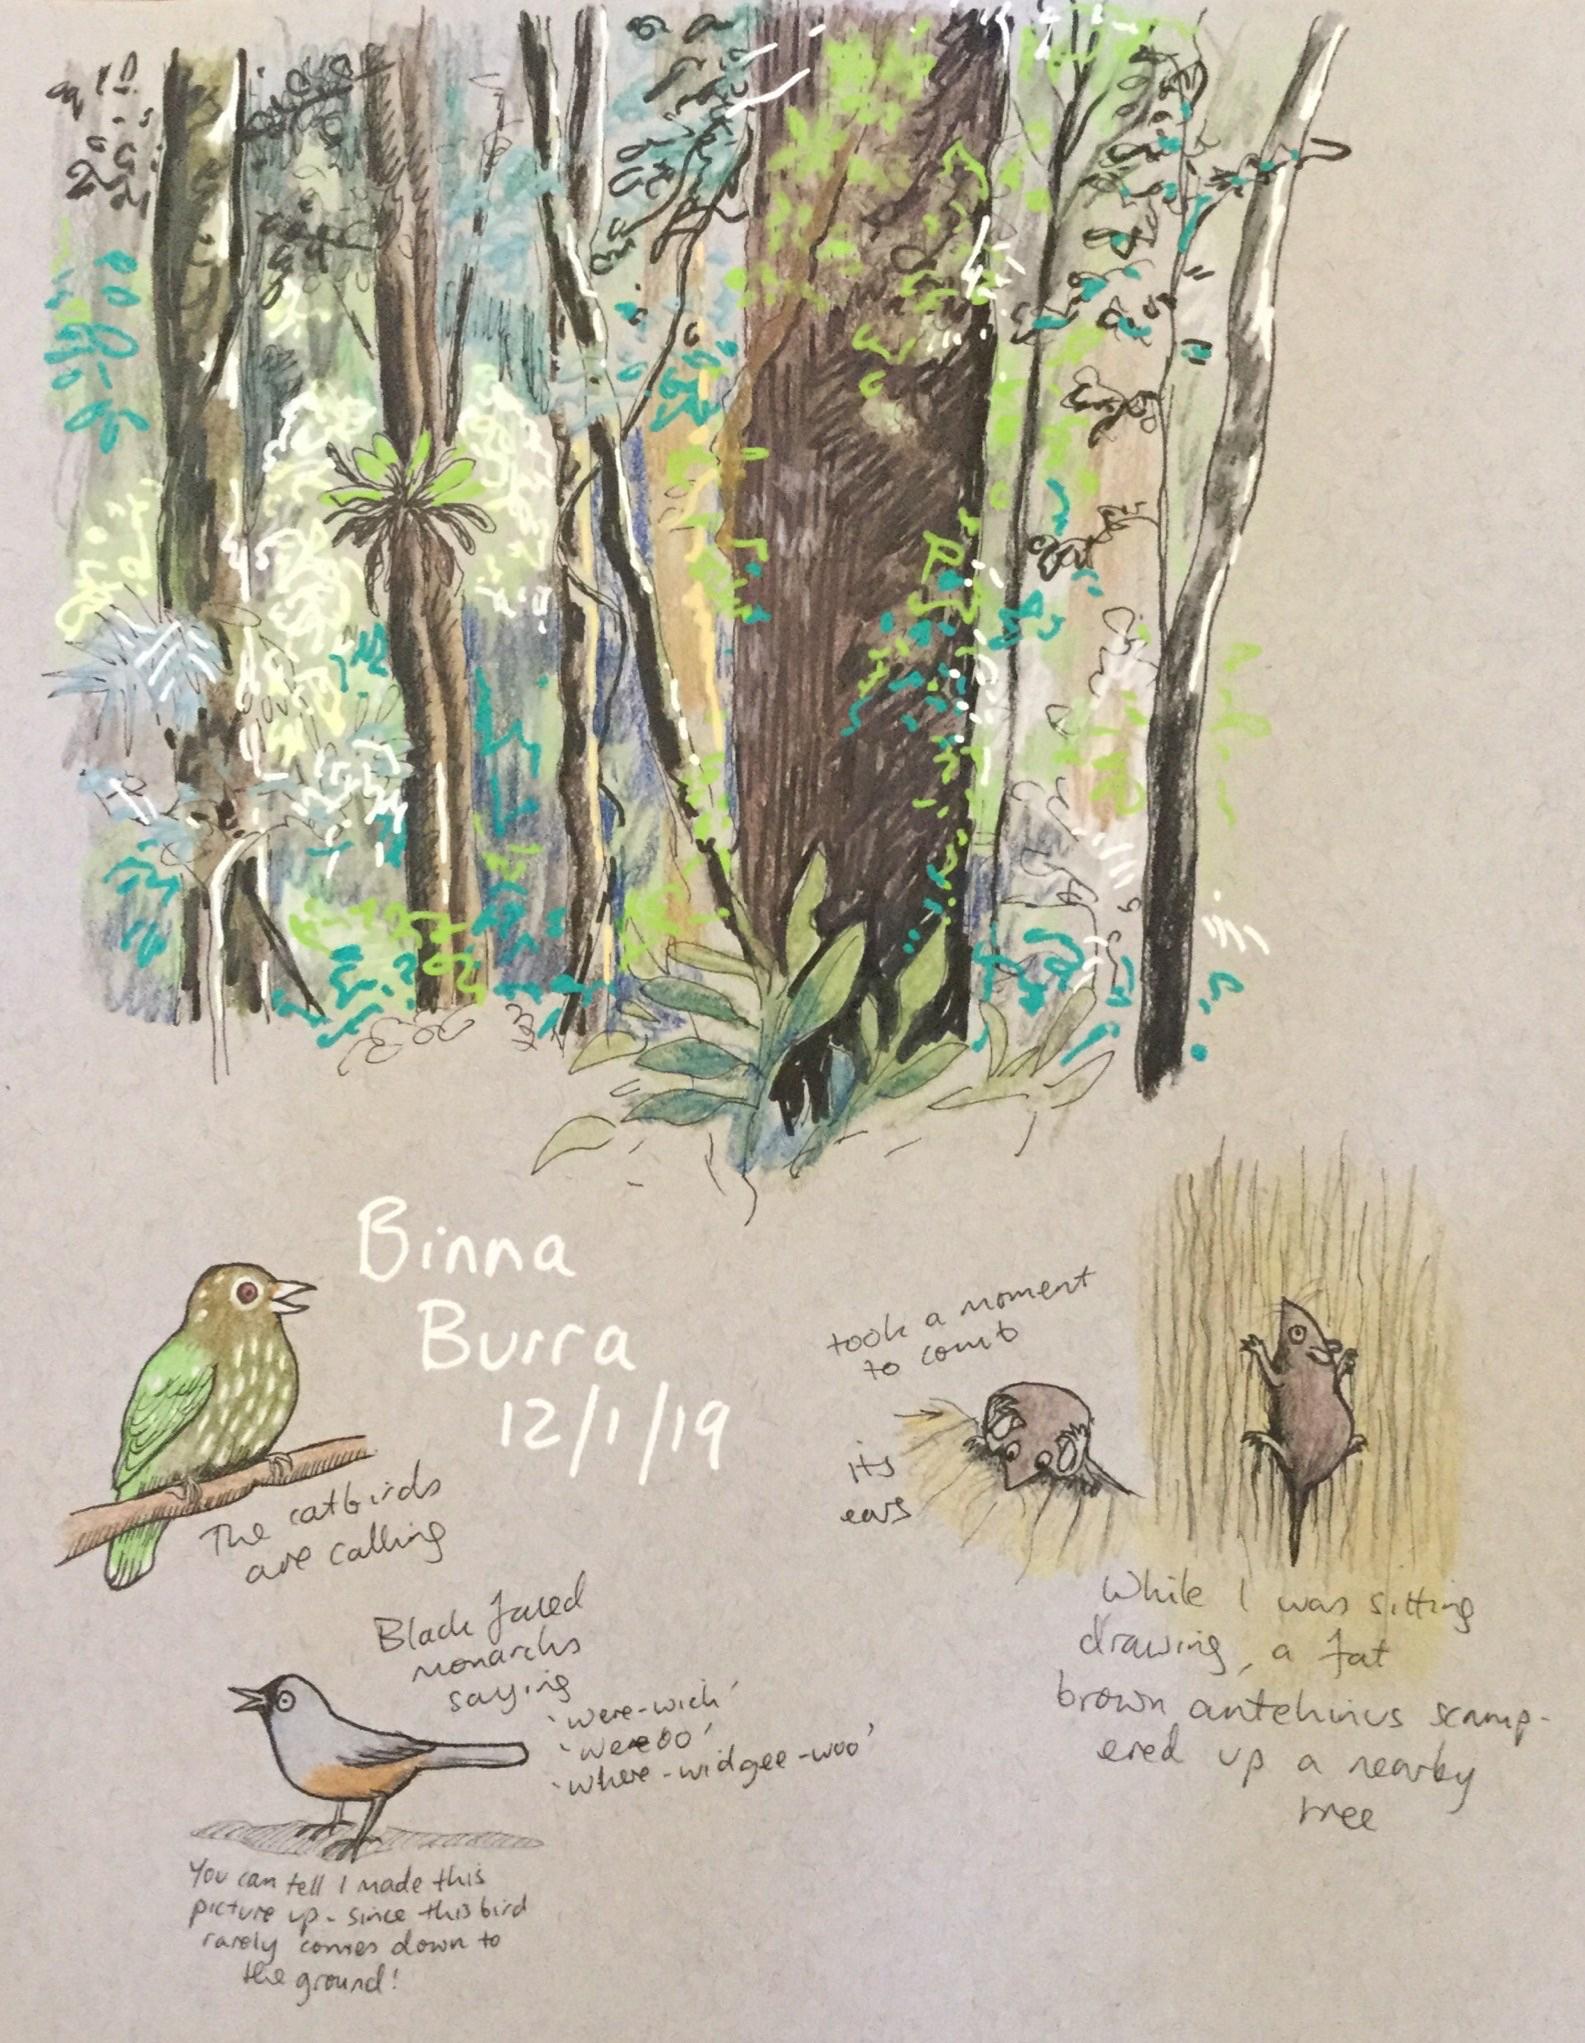 Free nature journaling workshop this Sunday